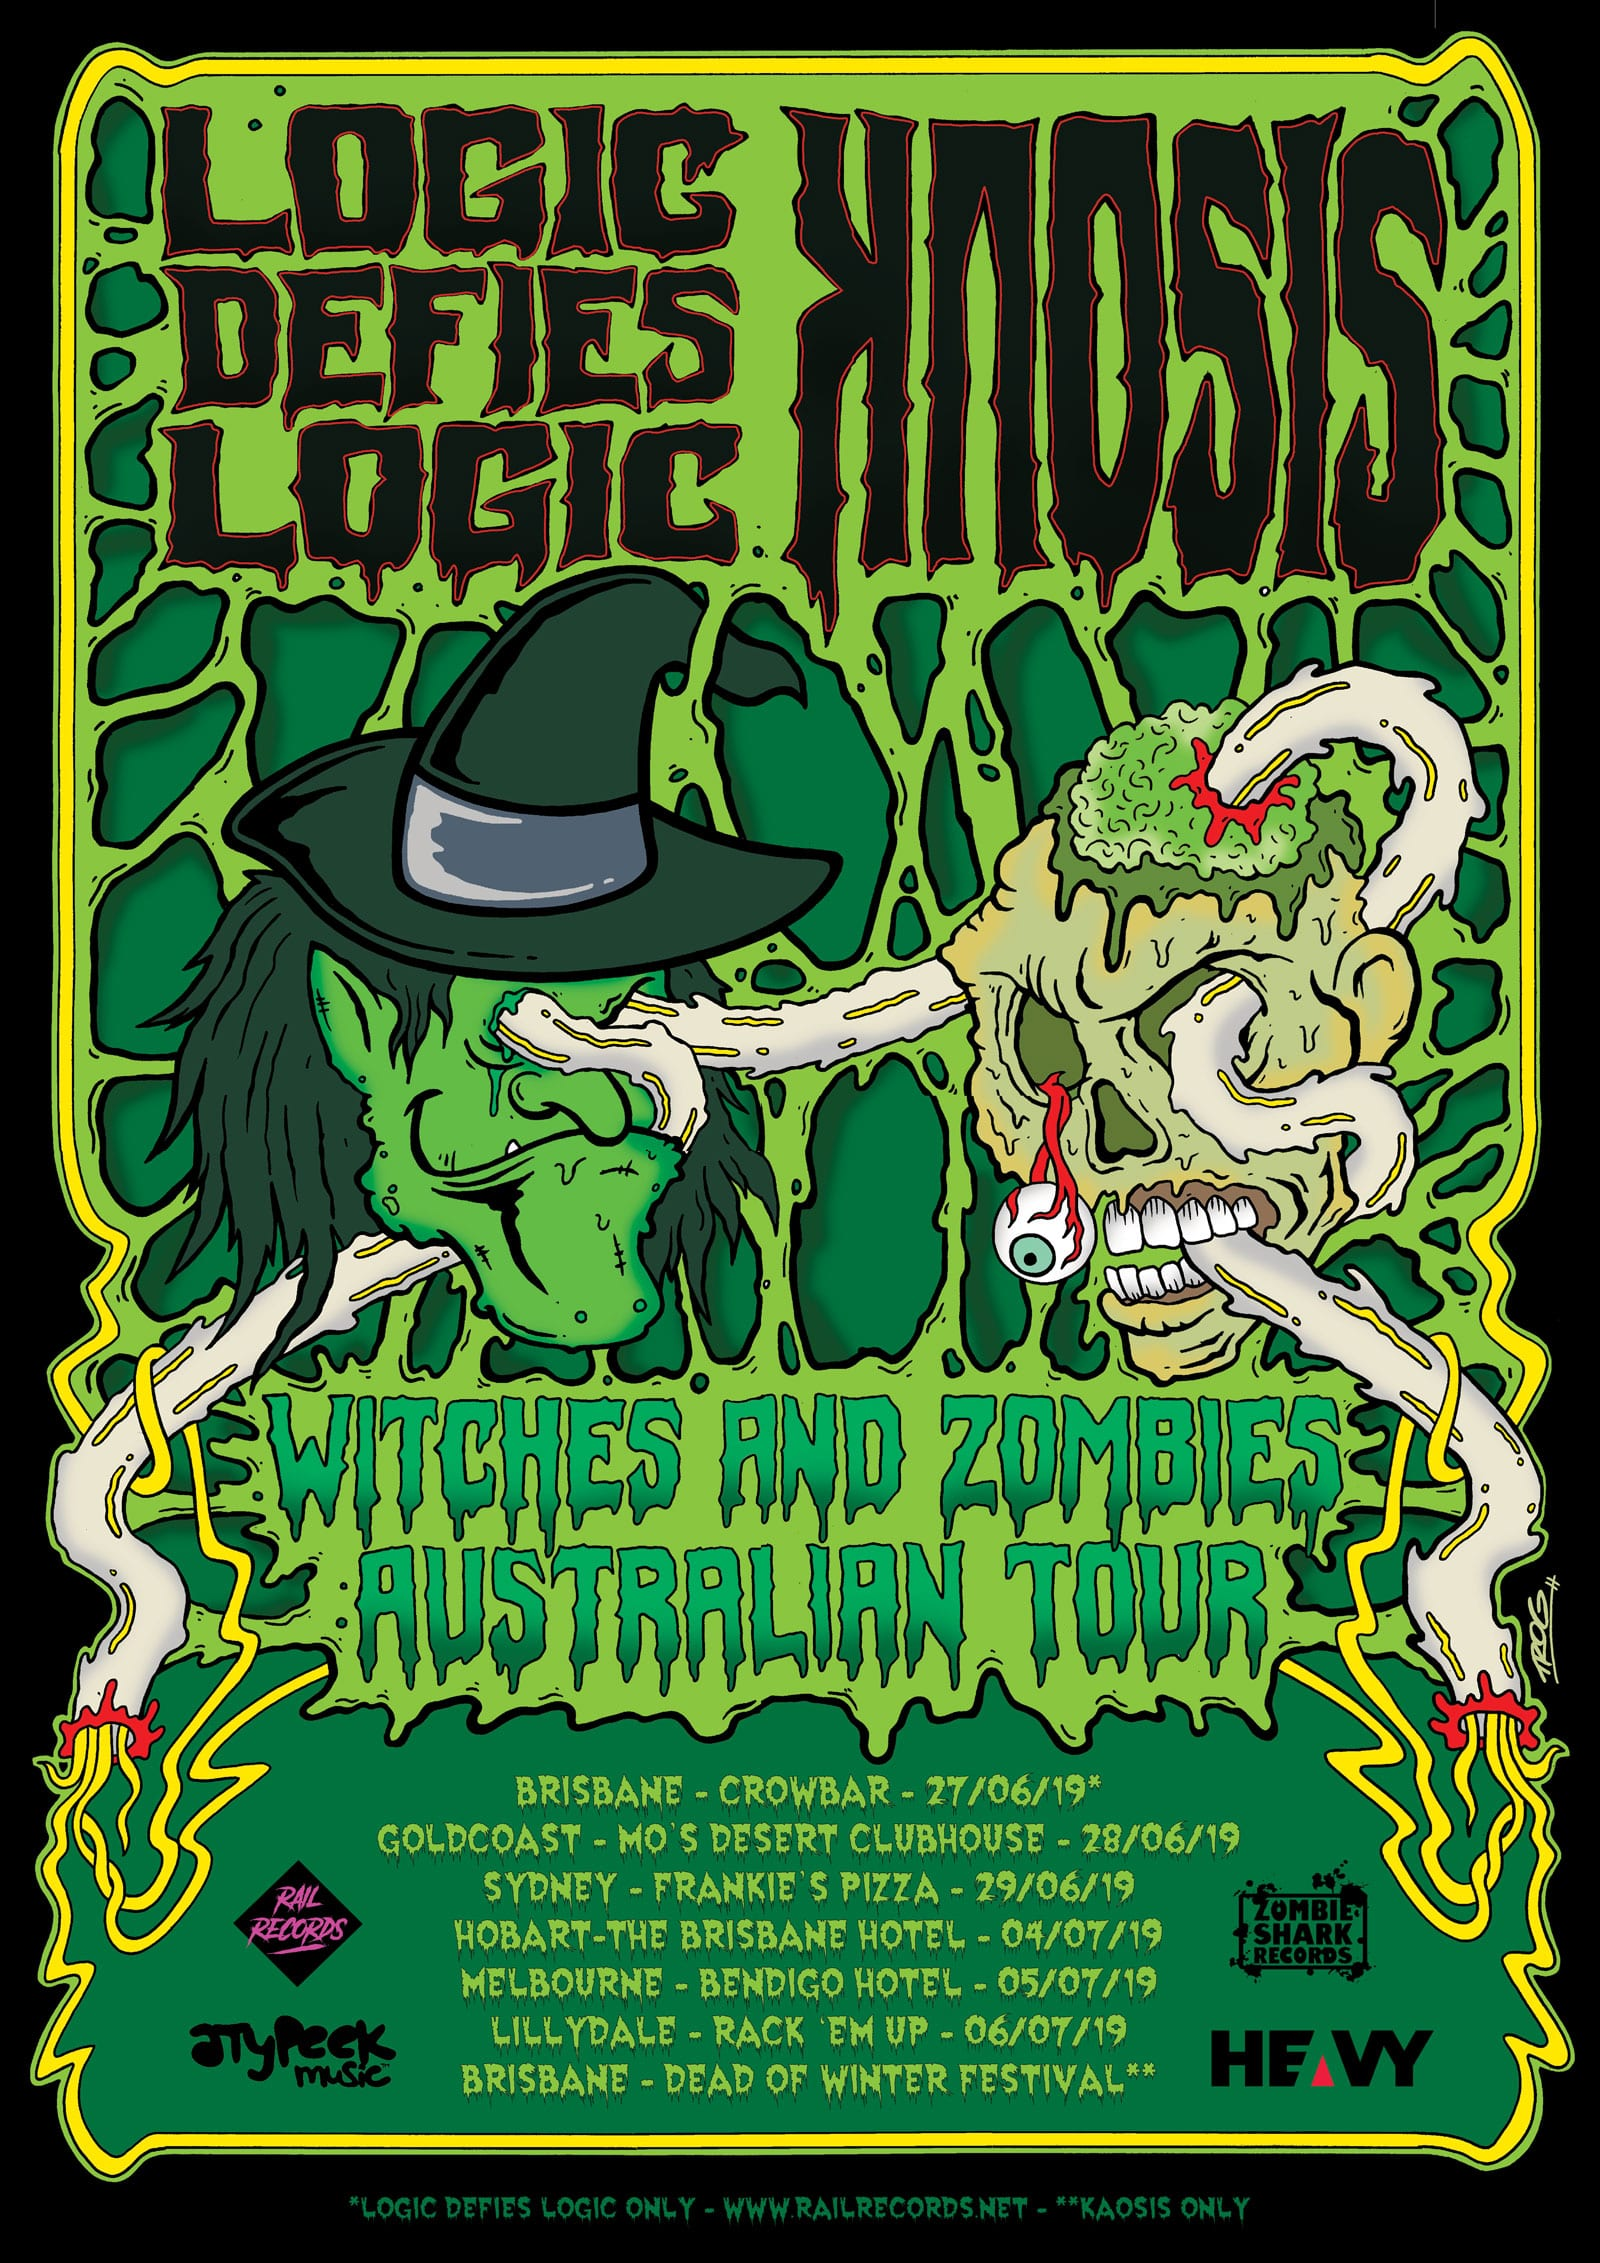 Logic Defies Logic and Kaosis - Tour poster - HEAVY-Magazine